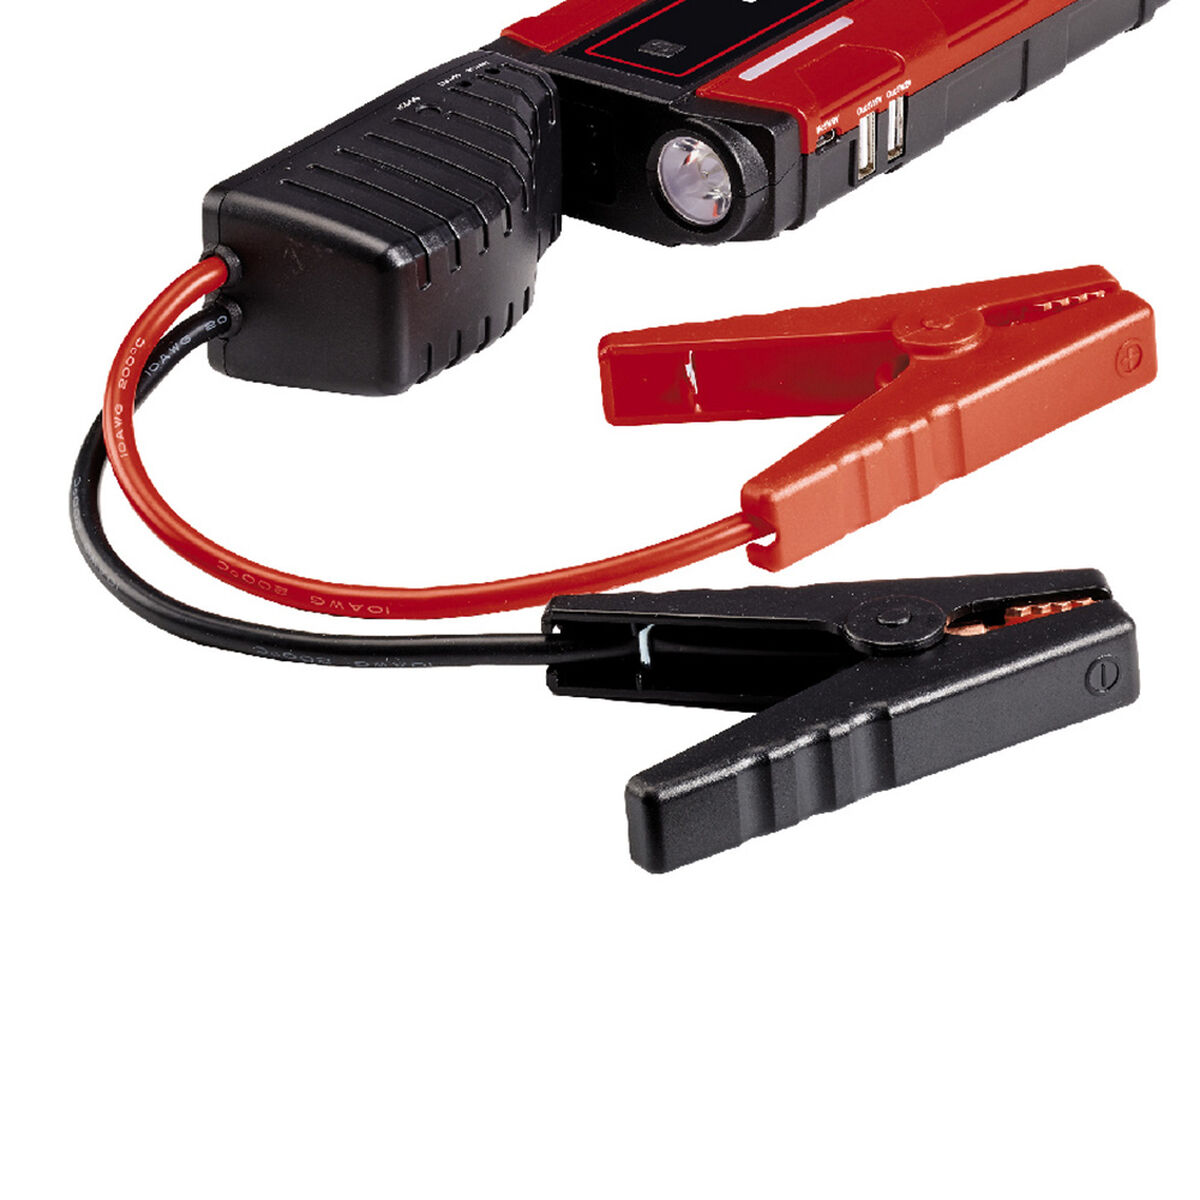 Cargador de Batería Einhell Car Expert CE-JS 8